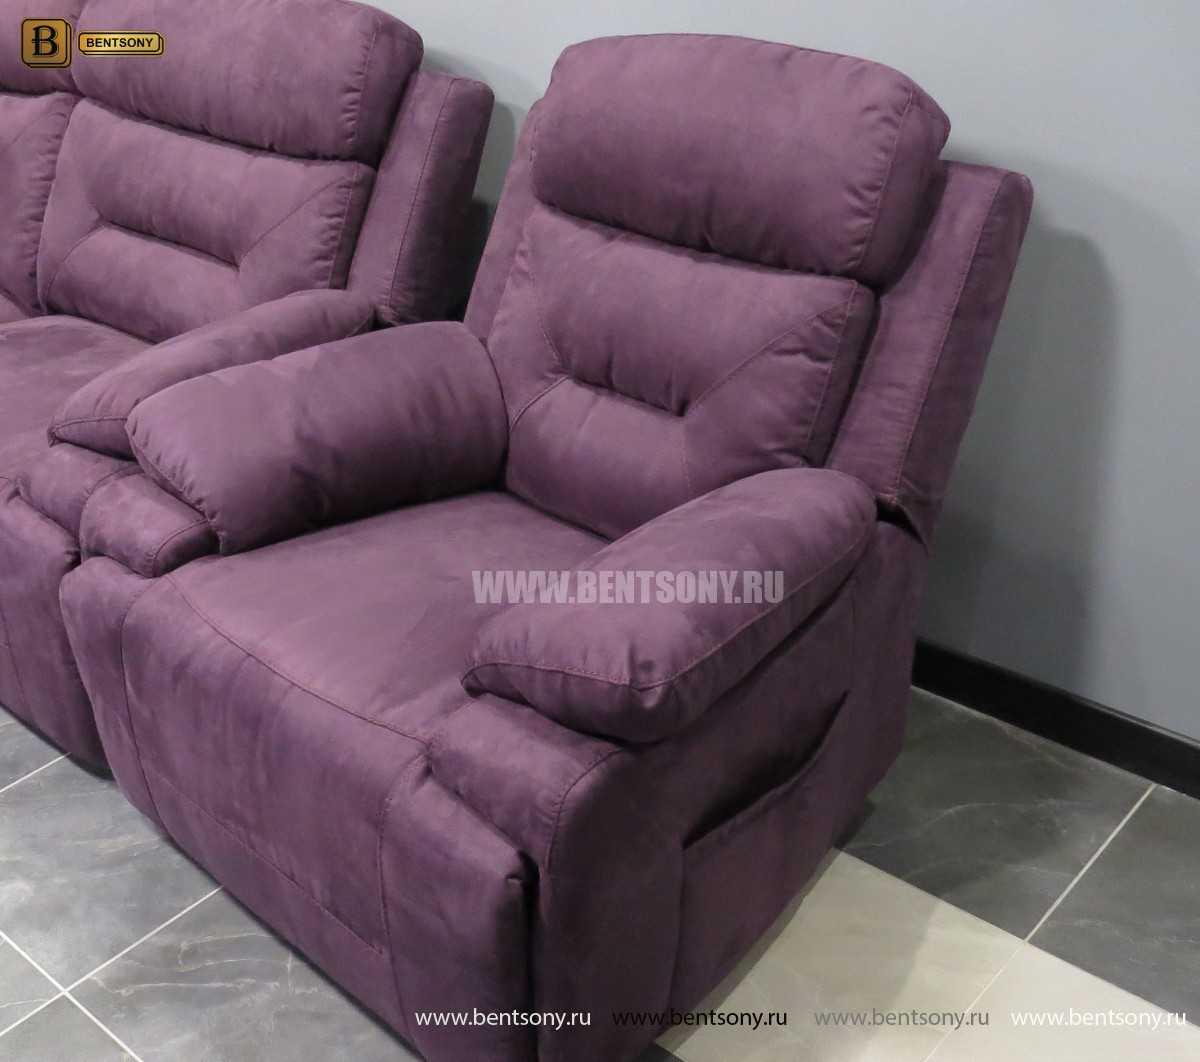 Кресло Амелия ( Алькантара) для квартиры